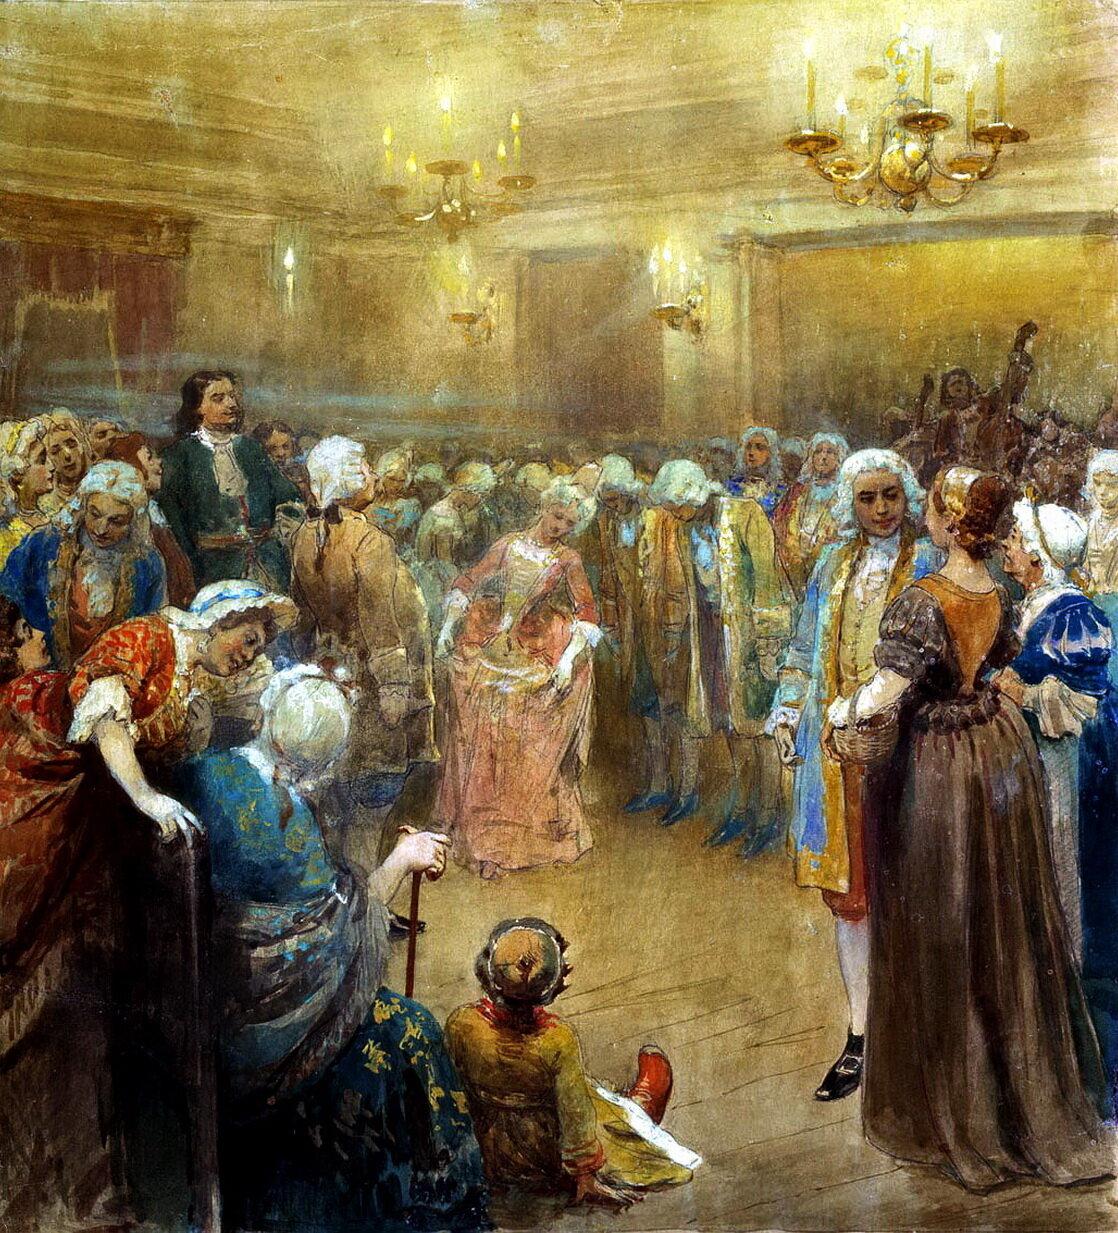 Клавдий Васильевич Лебедев (1852-1916). Ассамблея при дворе Петра I